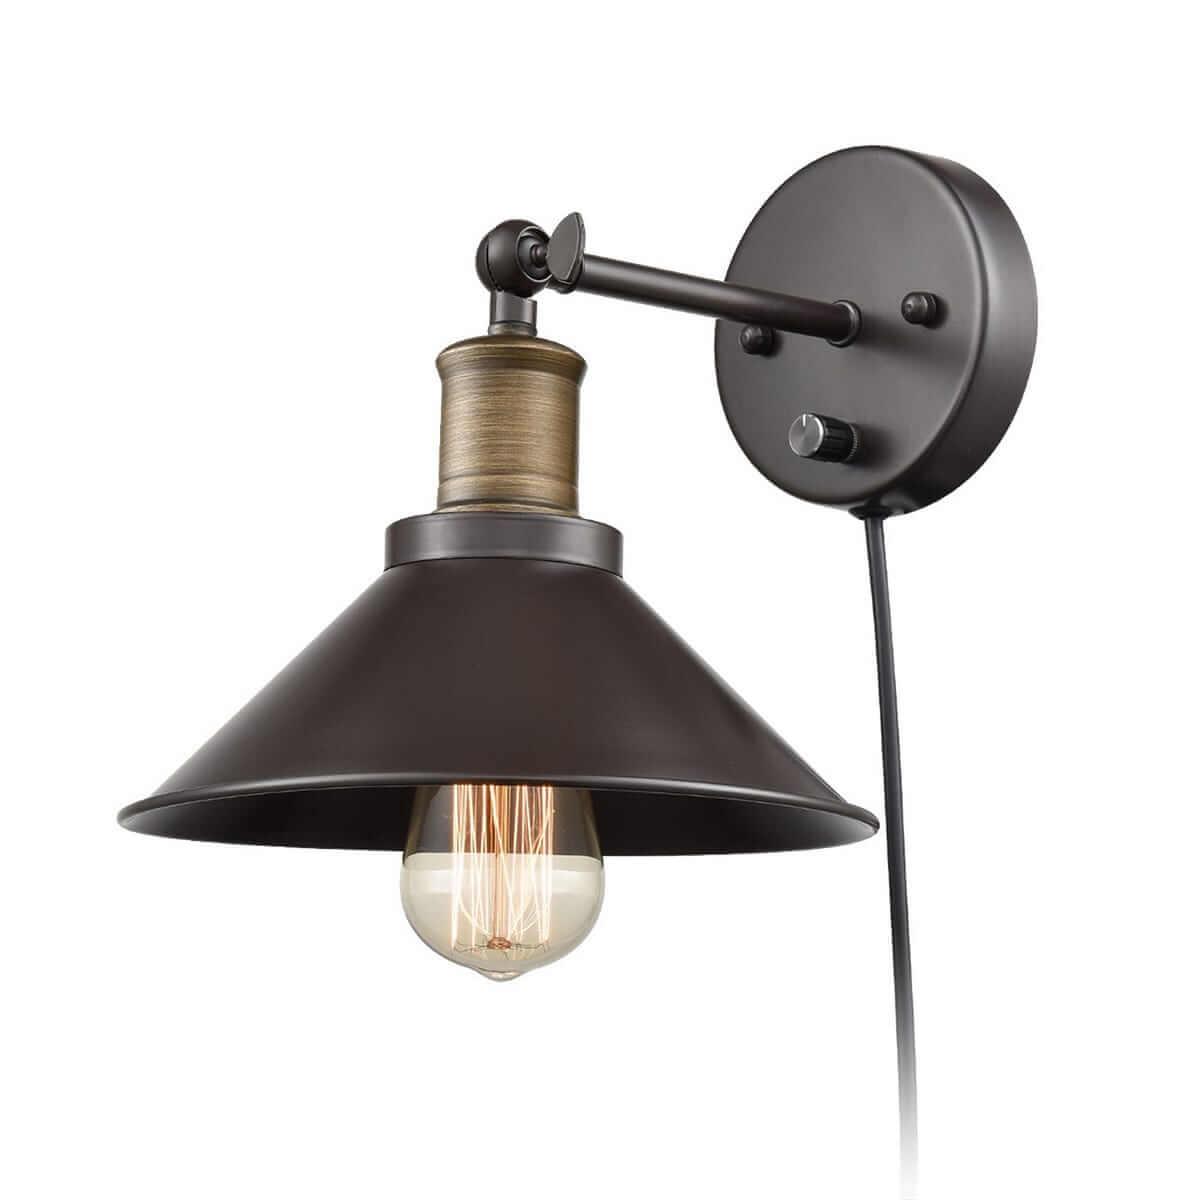 Industrial Bronze Swing Arm Plug-in Wall Lights 1-Light